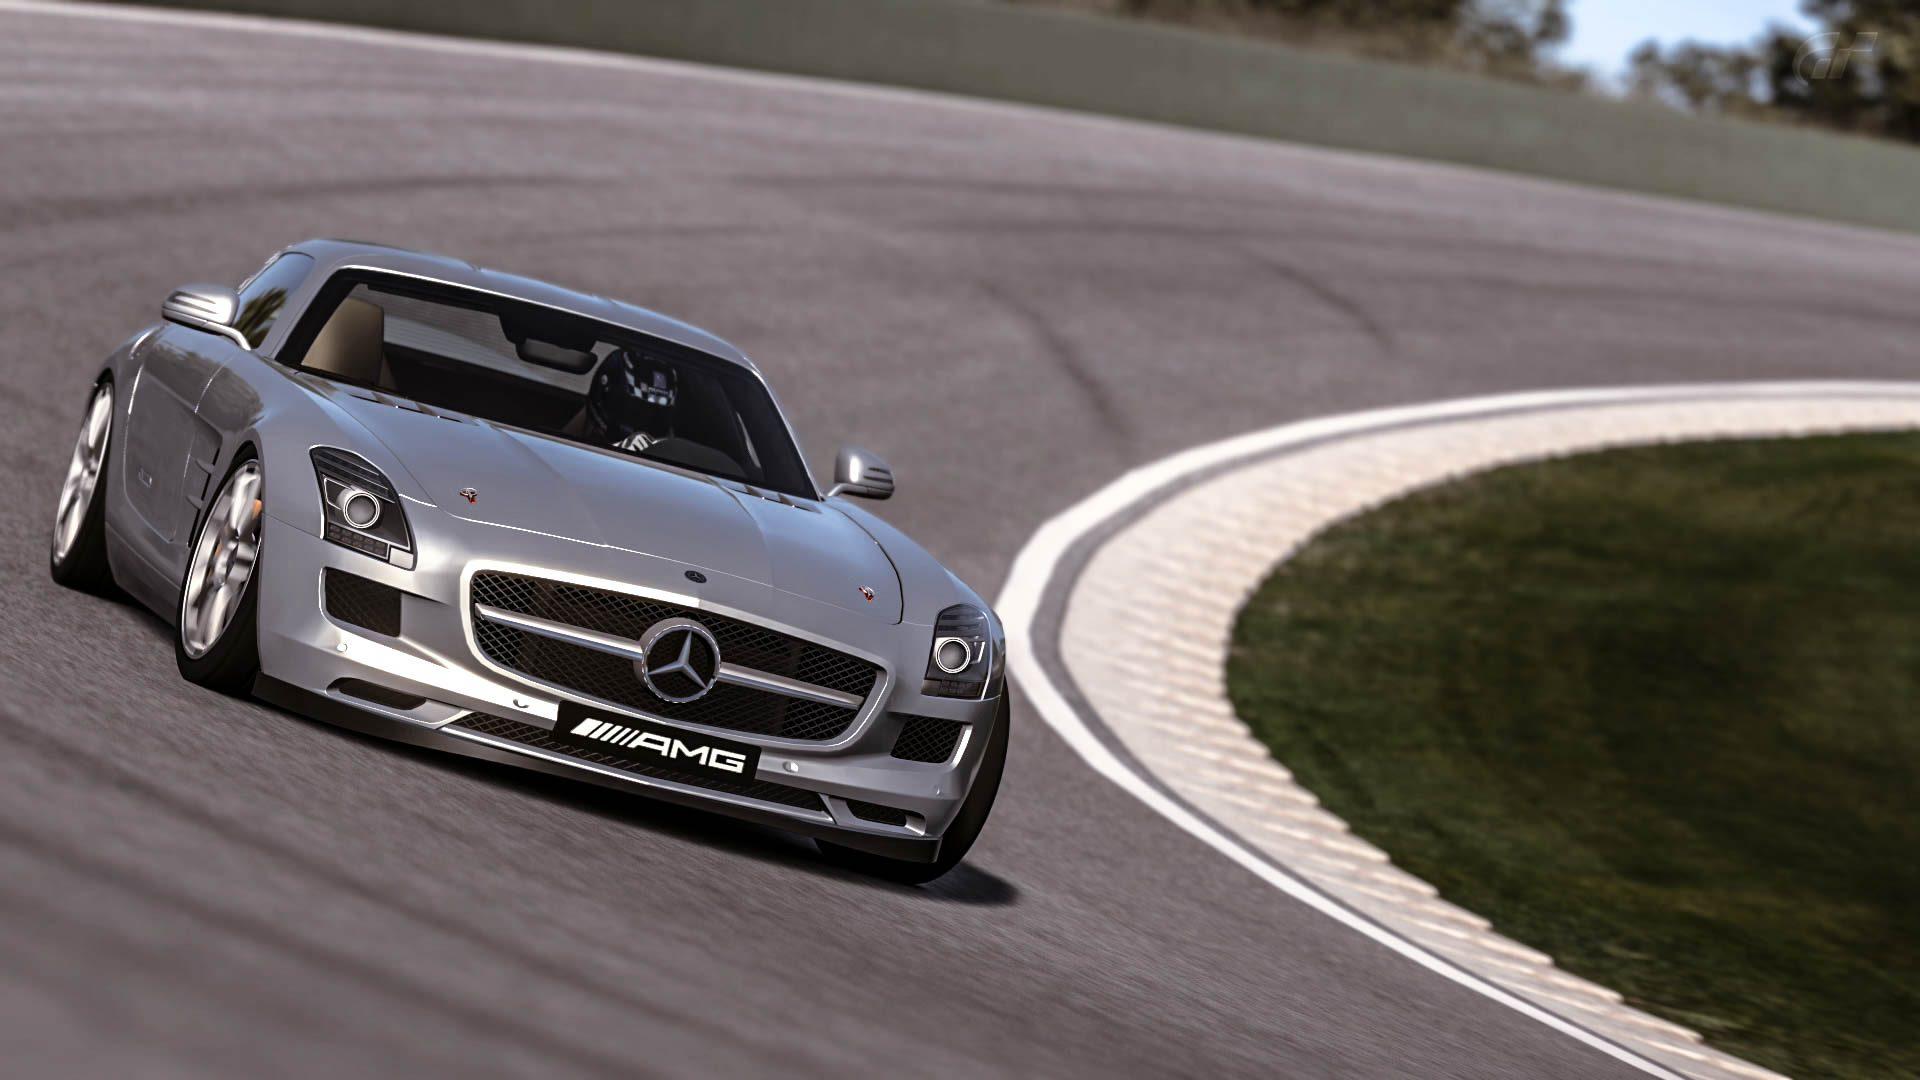 Mercedes_SLS_AMG_06.jpg